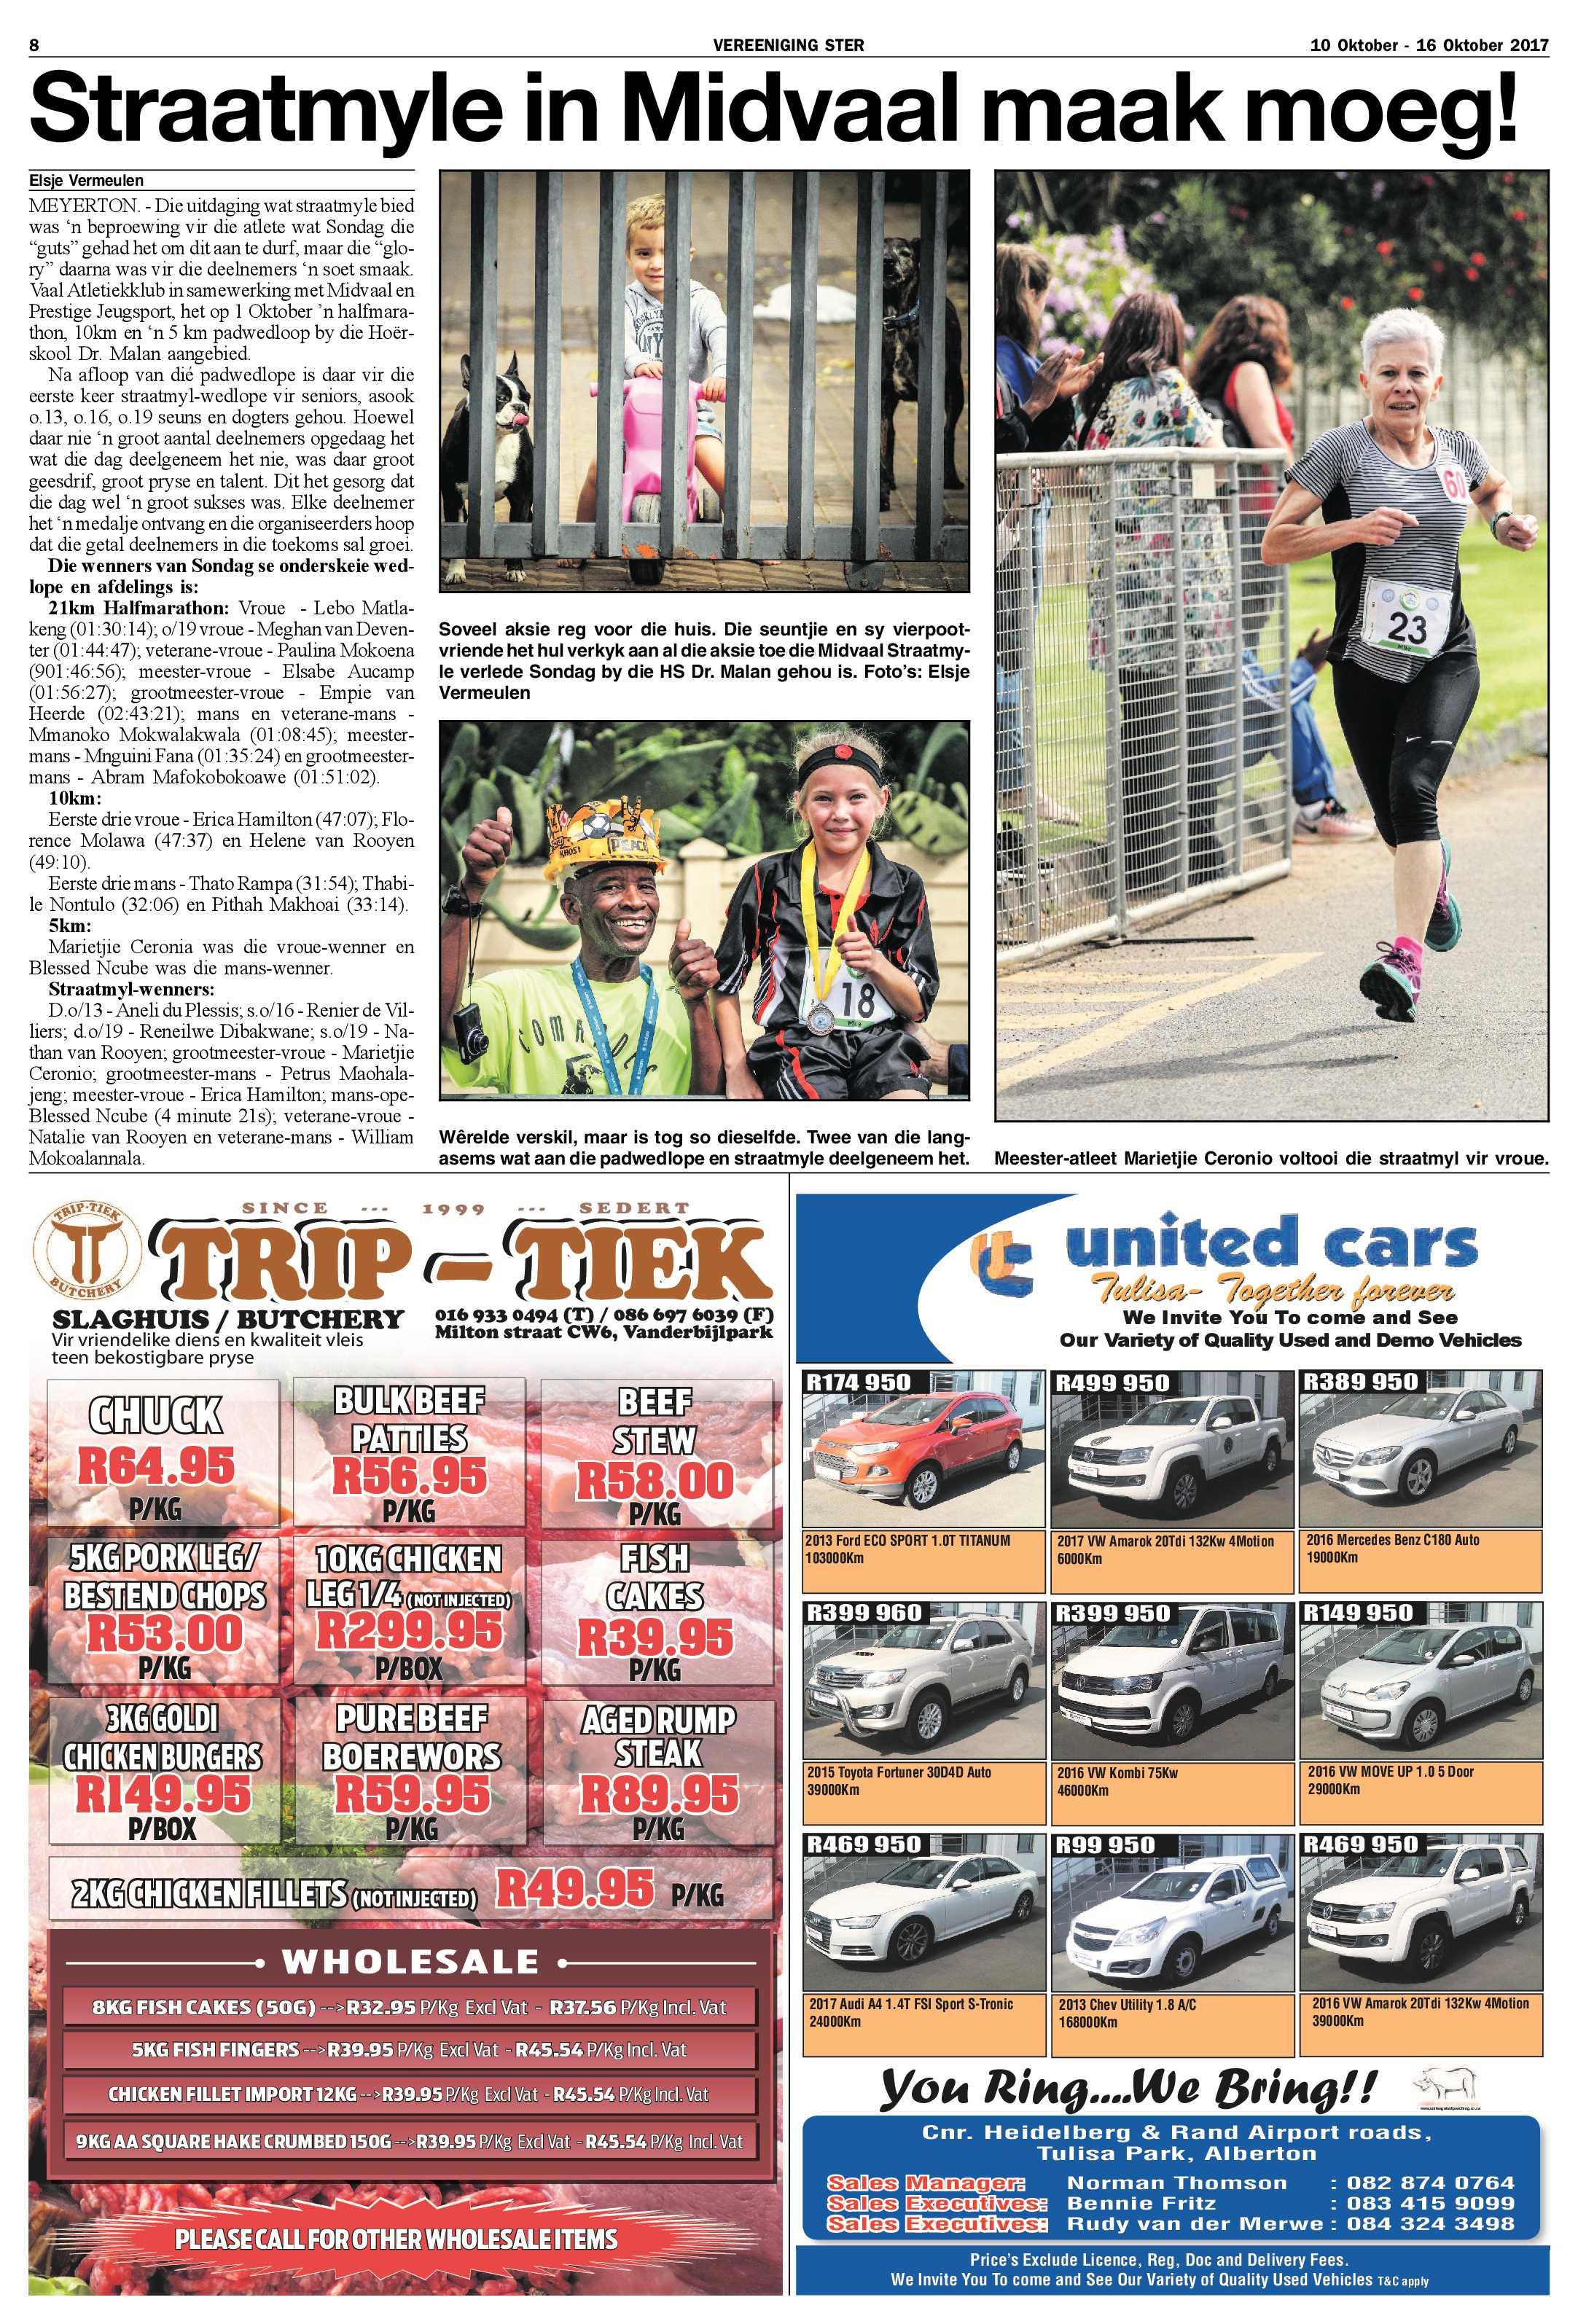 vereeniging-ster-10-16-oktober-2017-epapers-page-8